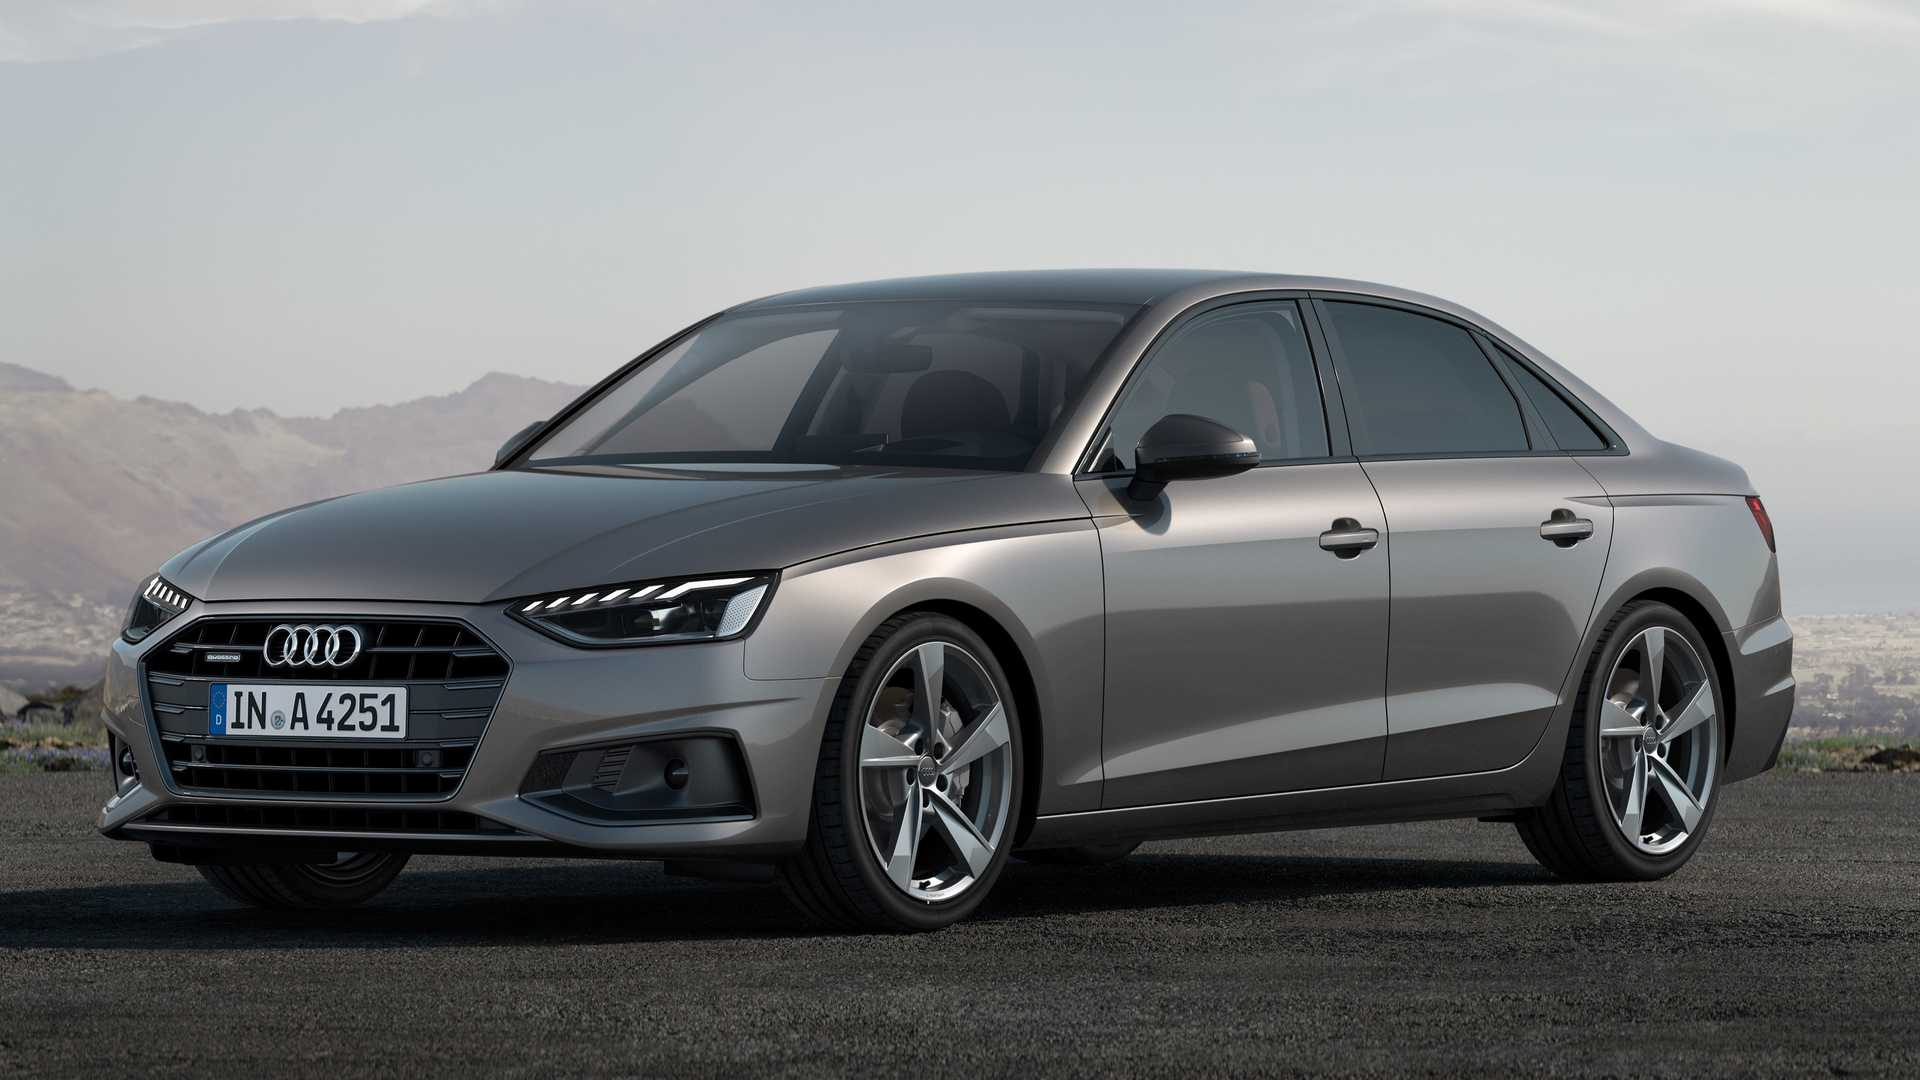 91 All New Audi A4 2020 Photos with Audi A4 2020